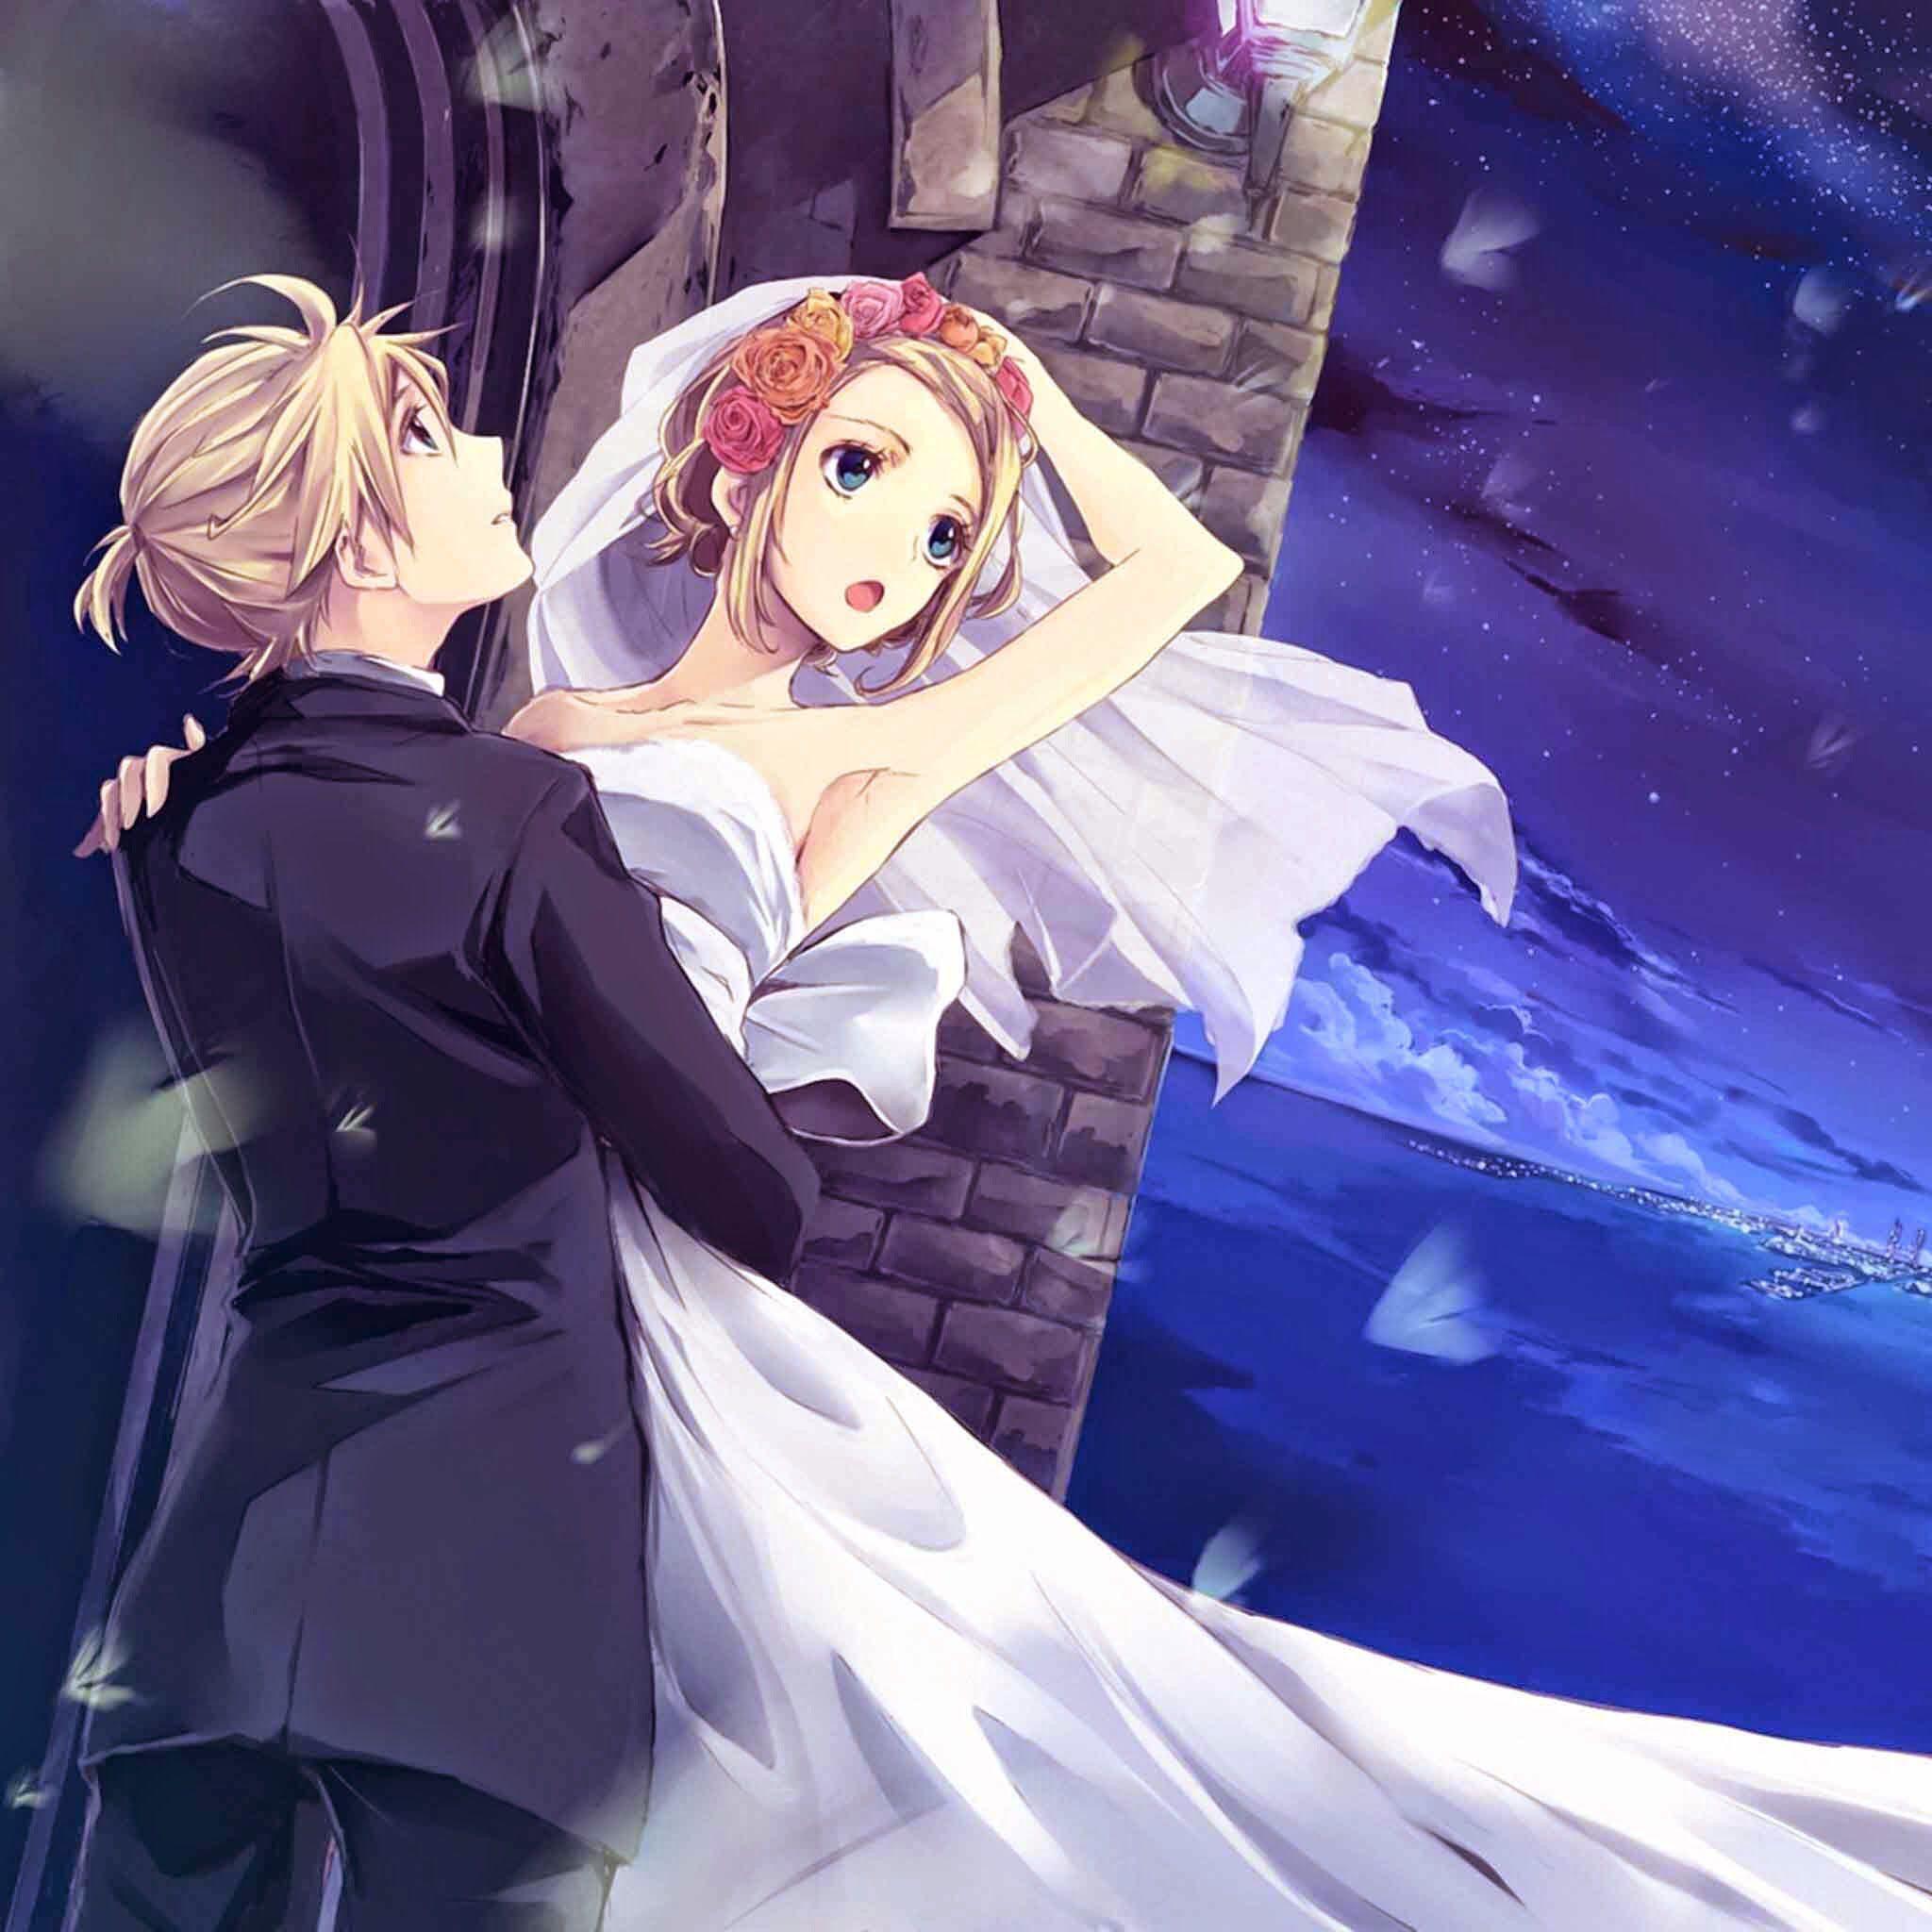 Epingle Par Asumi Riko Sur Anime Love Story 3 Pinterest